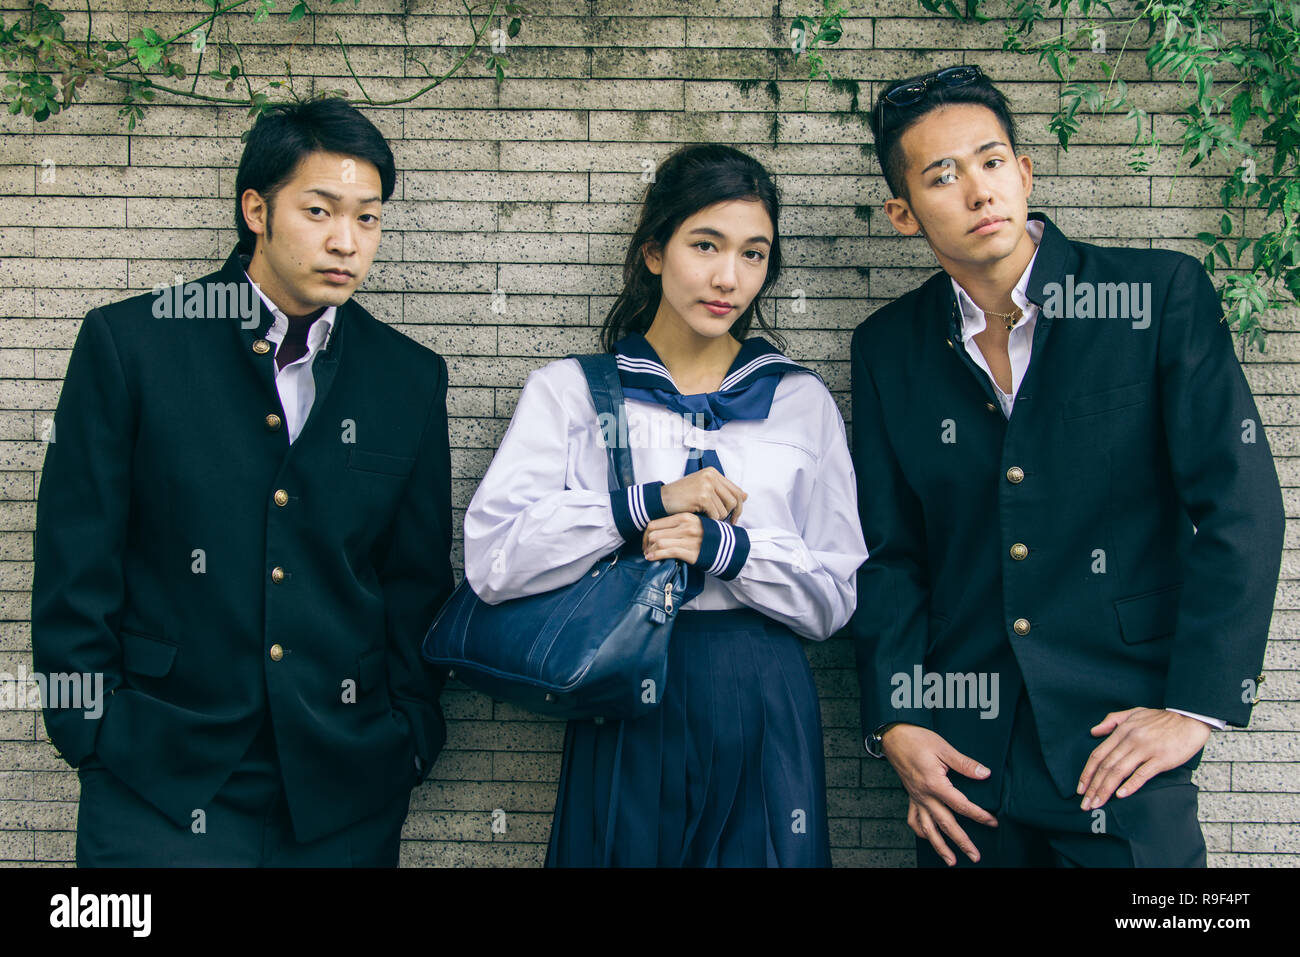 1cb8ec1a1 Yung estudiantes japoneses con uniforme escolar pegado al aire libre ...